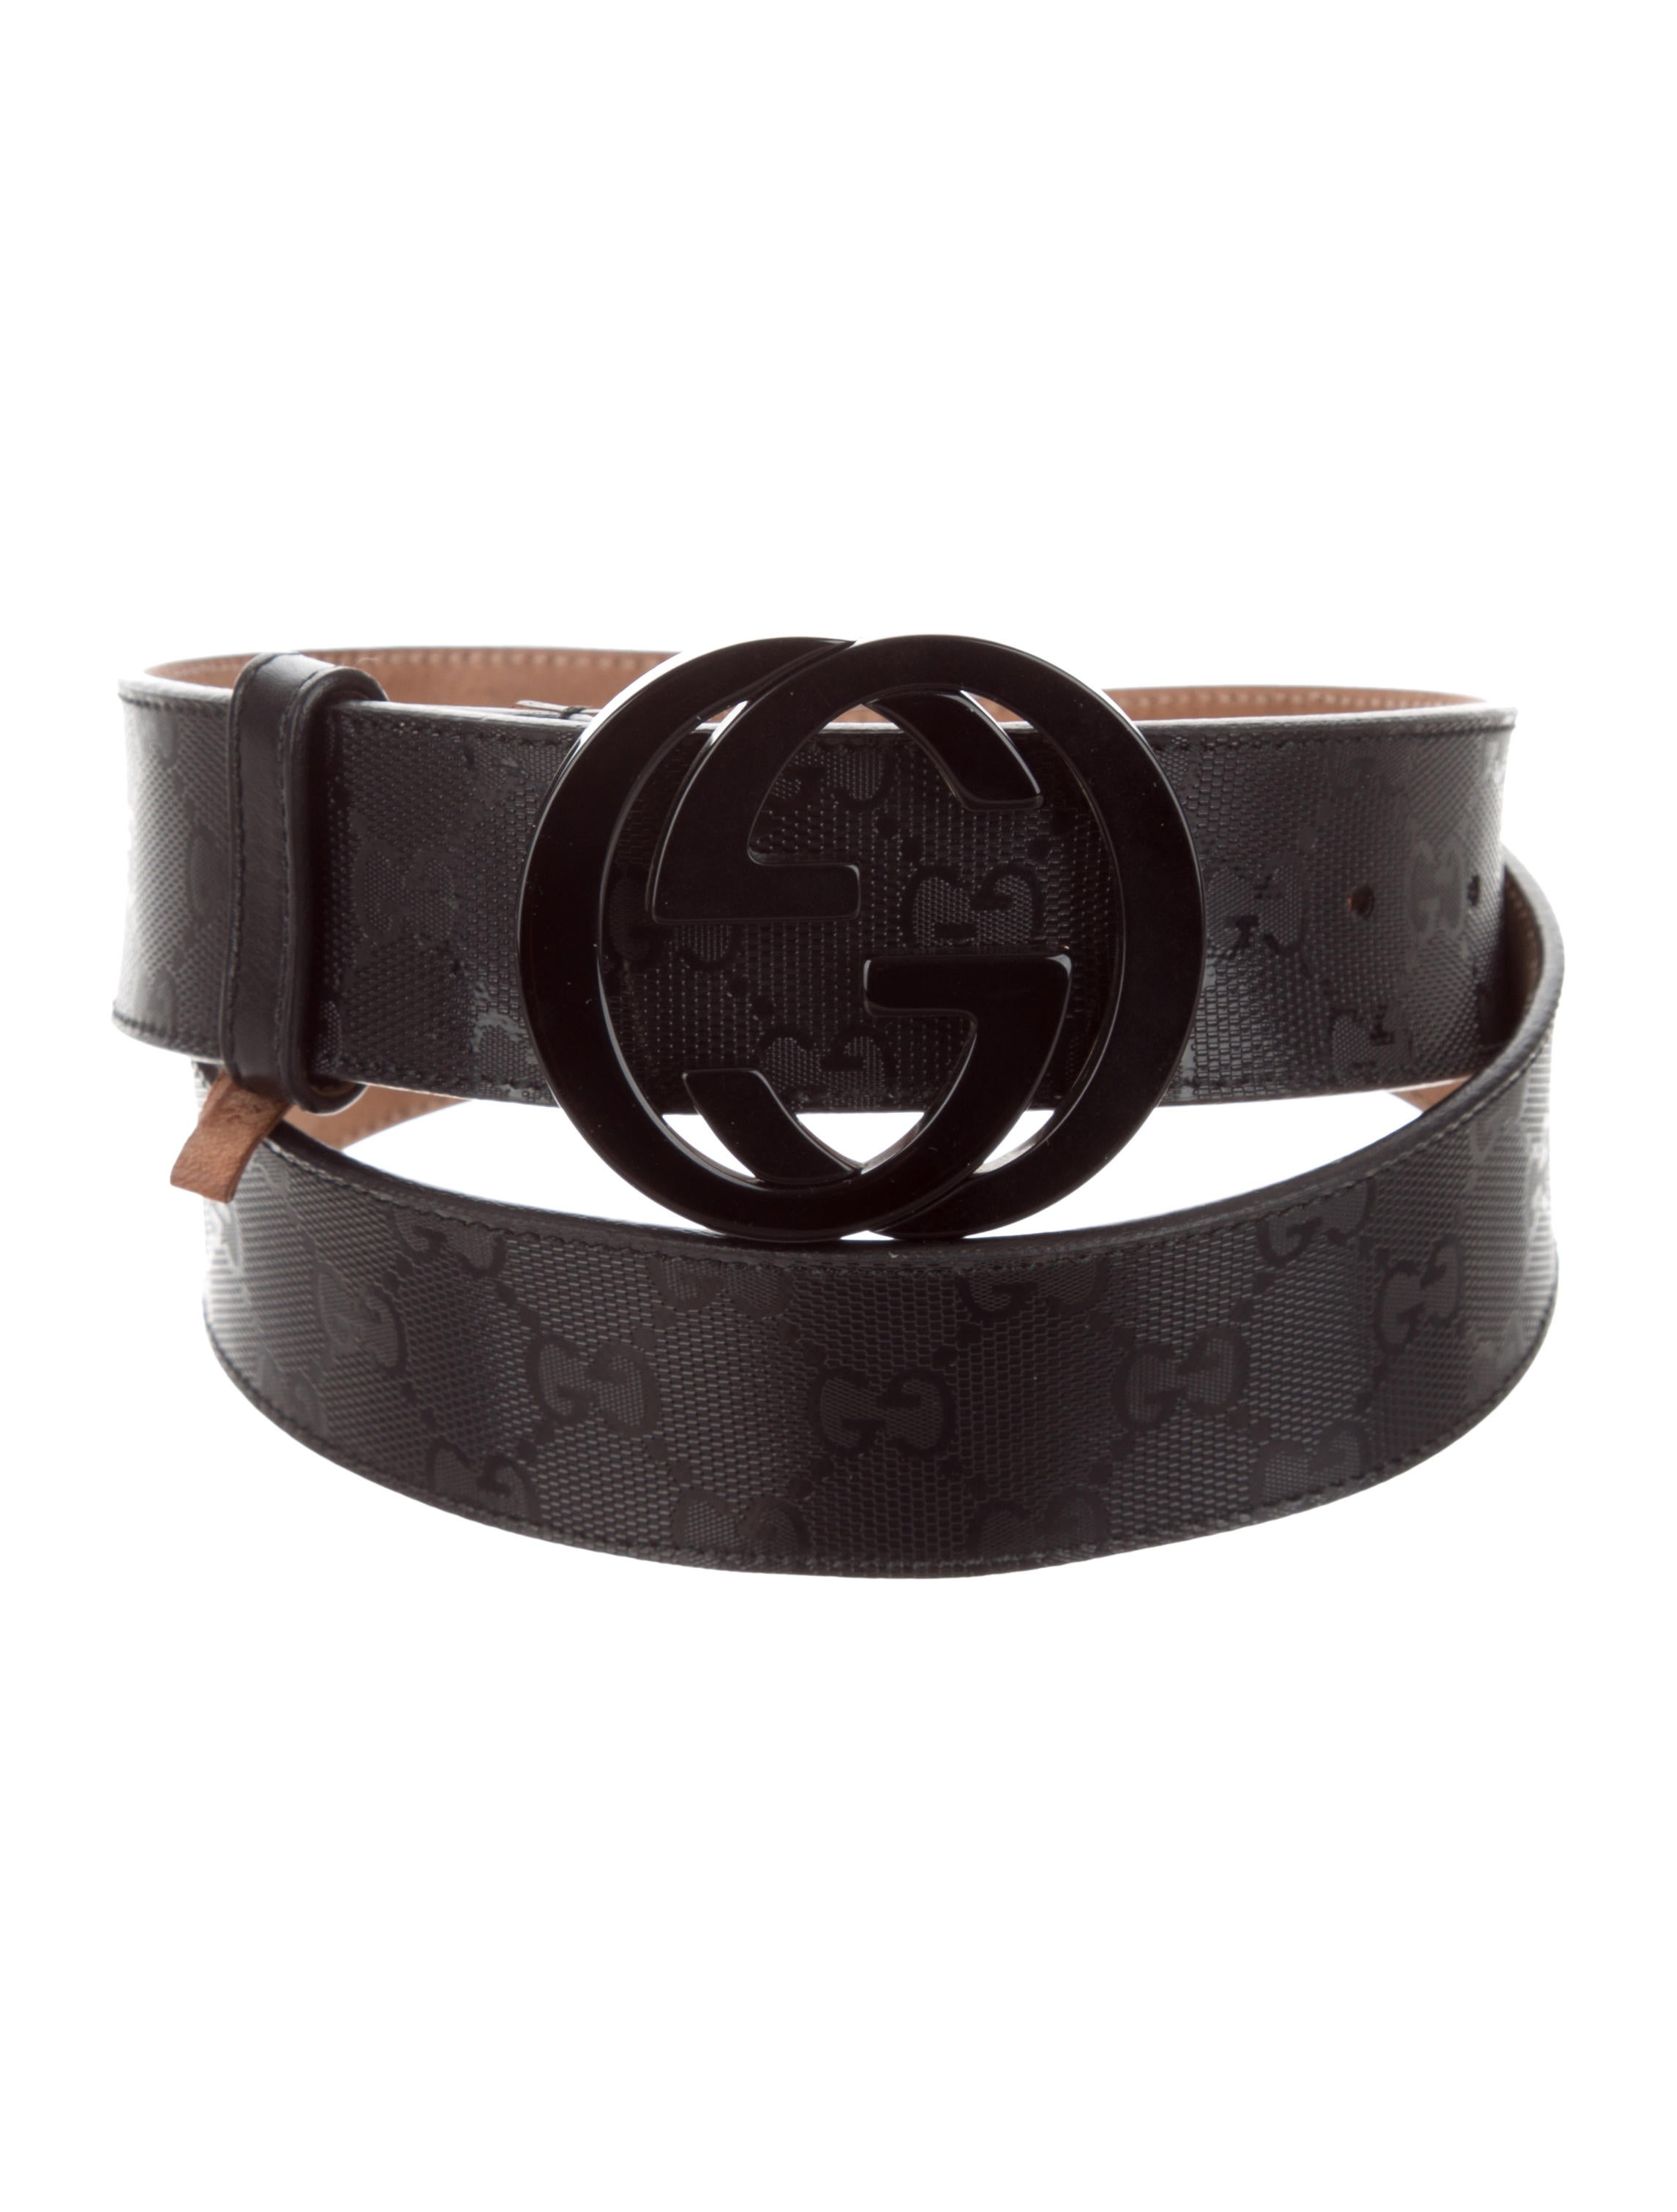 83400fdcaaa Gucci GG Imprimé Belt - Accessories - GUC269438